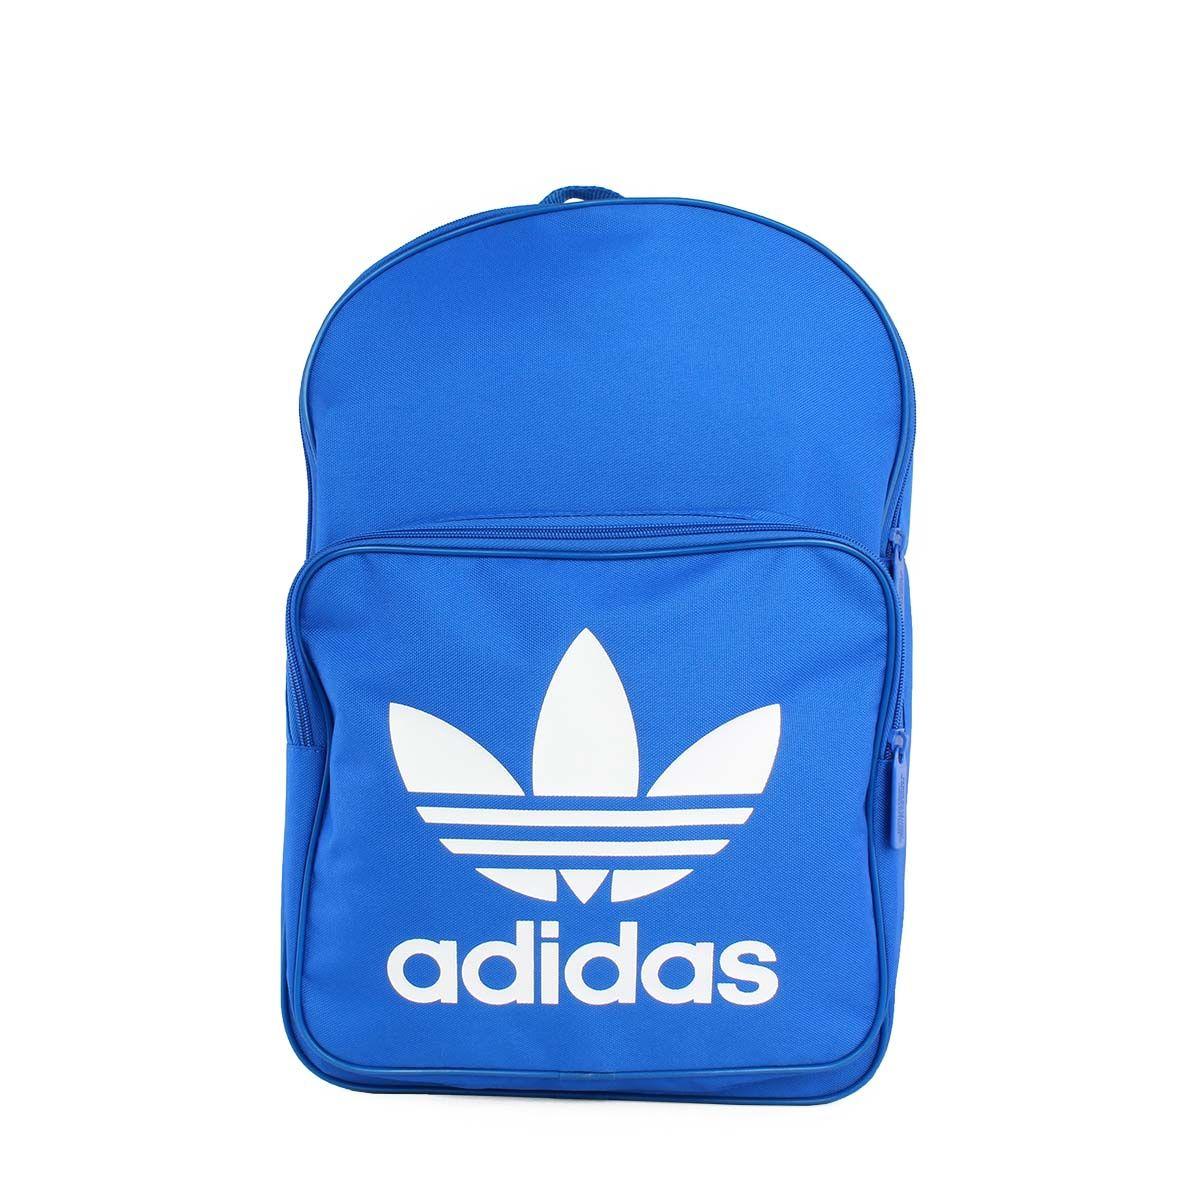 a82bb89813 Adidas Classic Trefoil Backpack μπλε.  sneakerstown  adidas  adidasoriginals   adidasclassic  classic  adidastrefoil  trefoil  backpack  fashion   streetwear ...